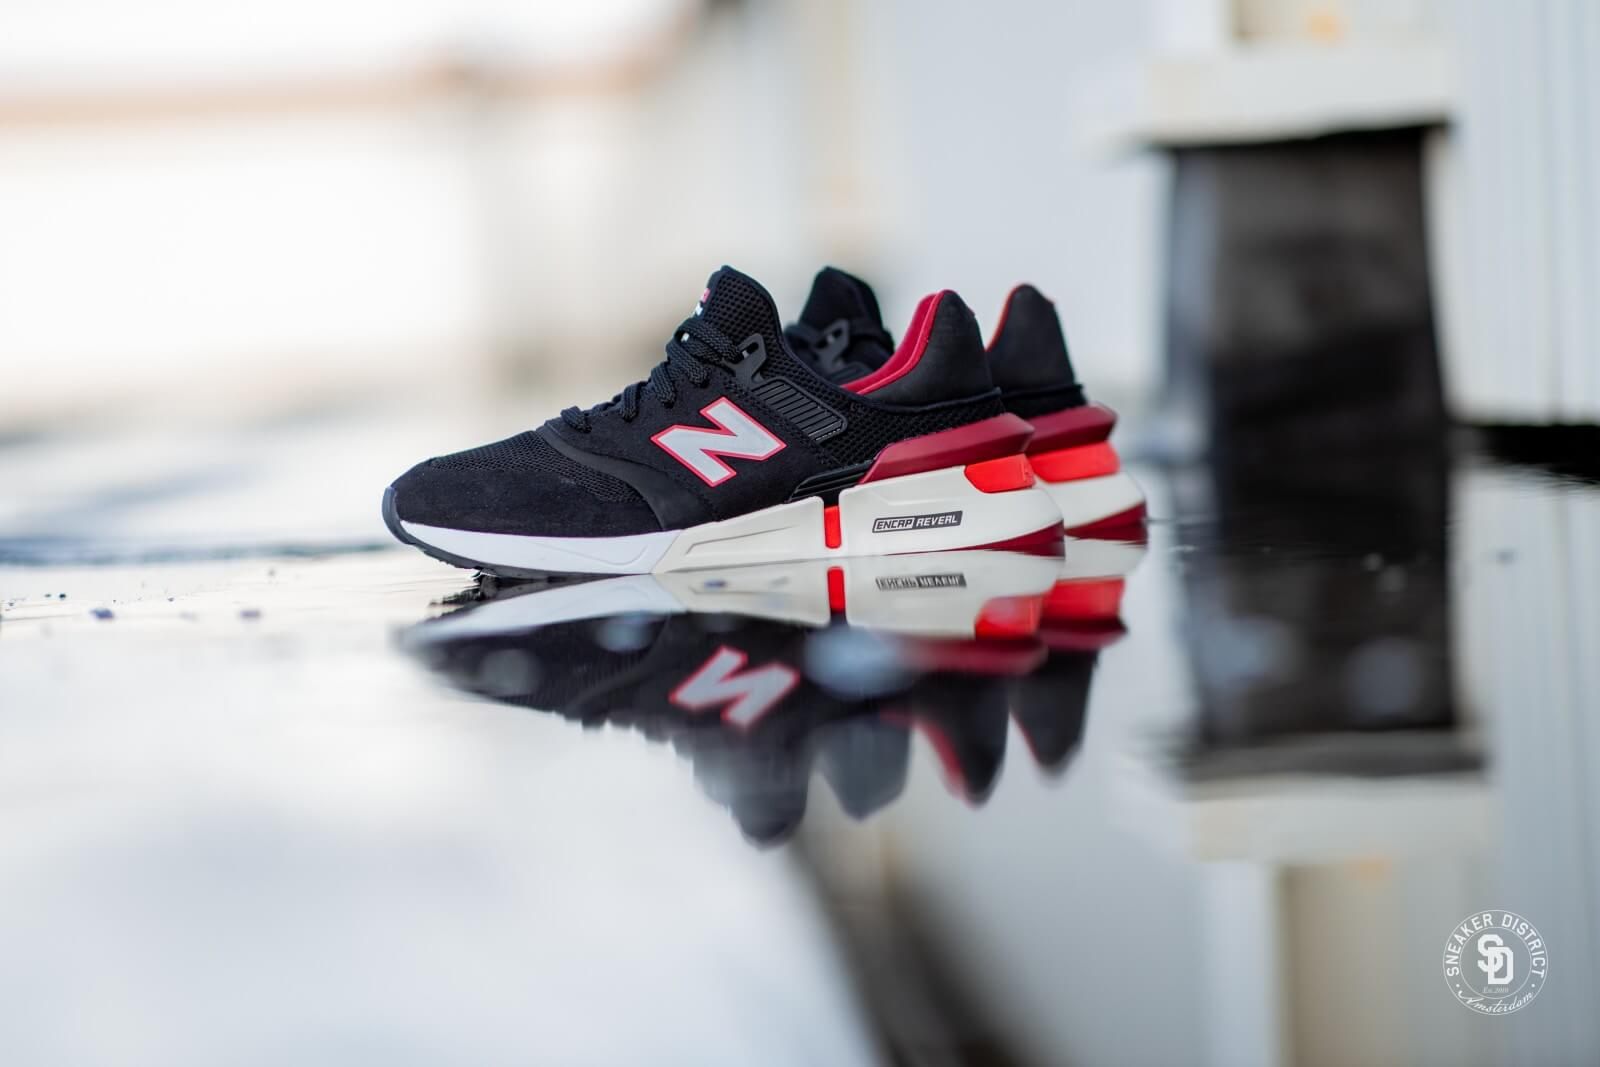 New Balance MS997RD Black/Red - 740441-60-8